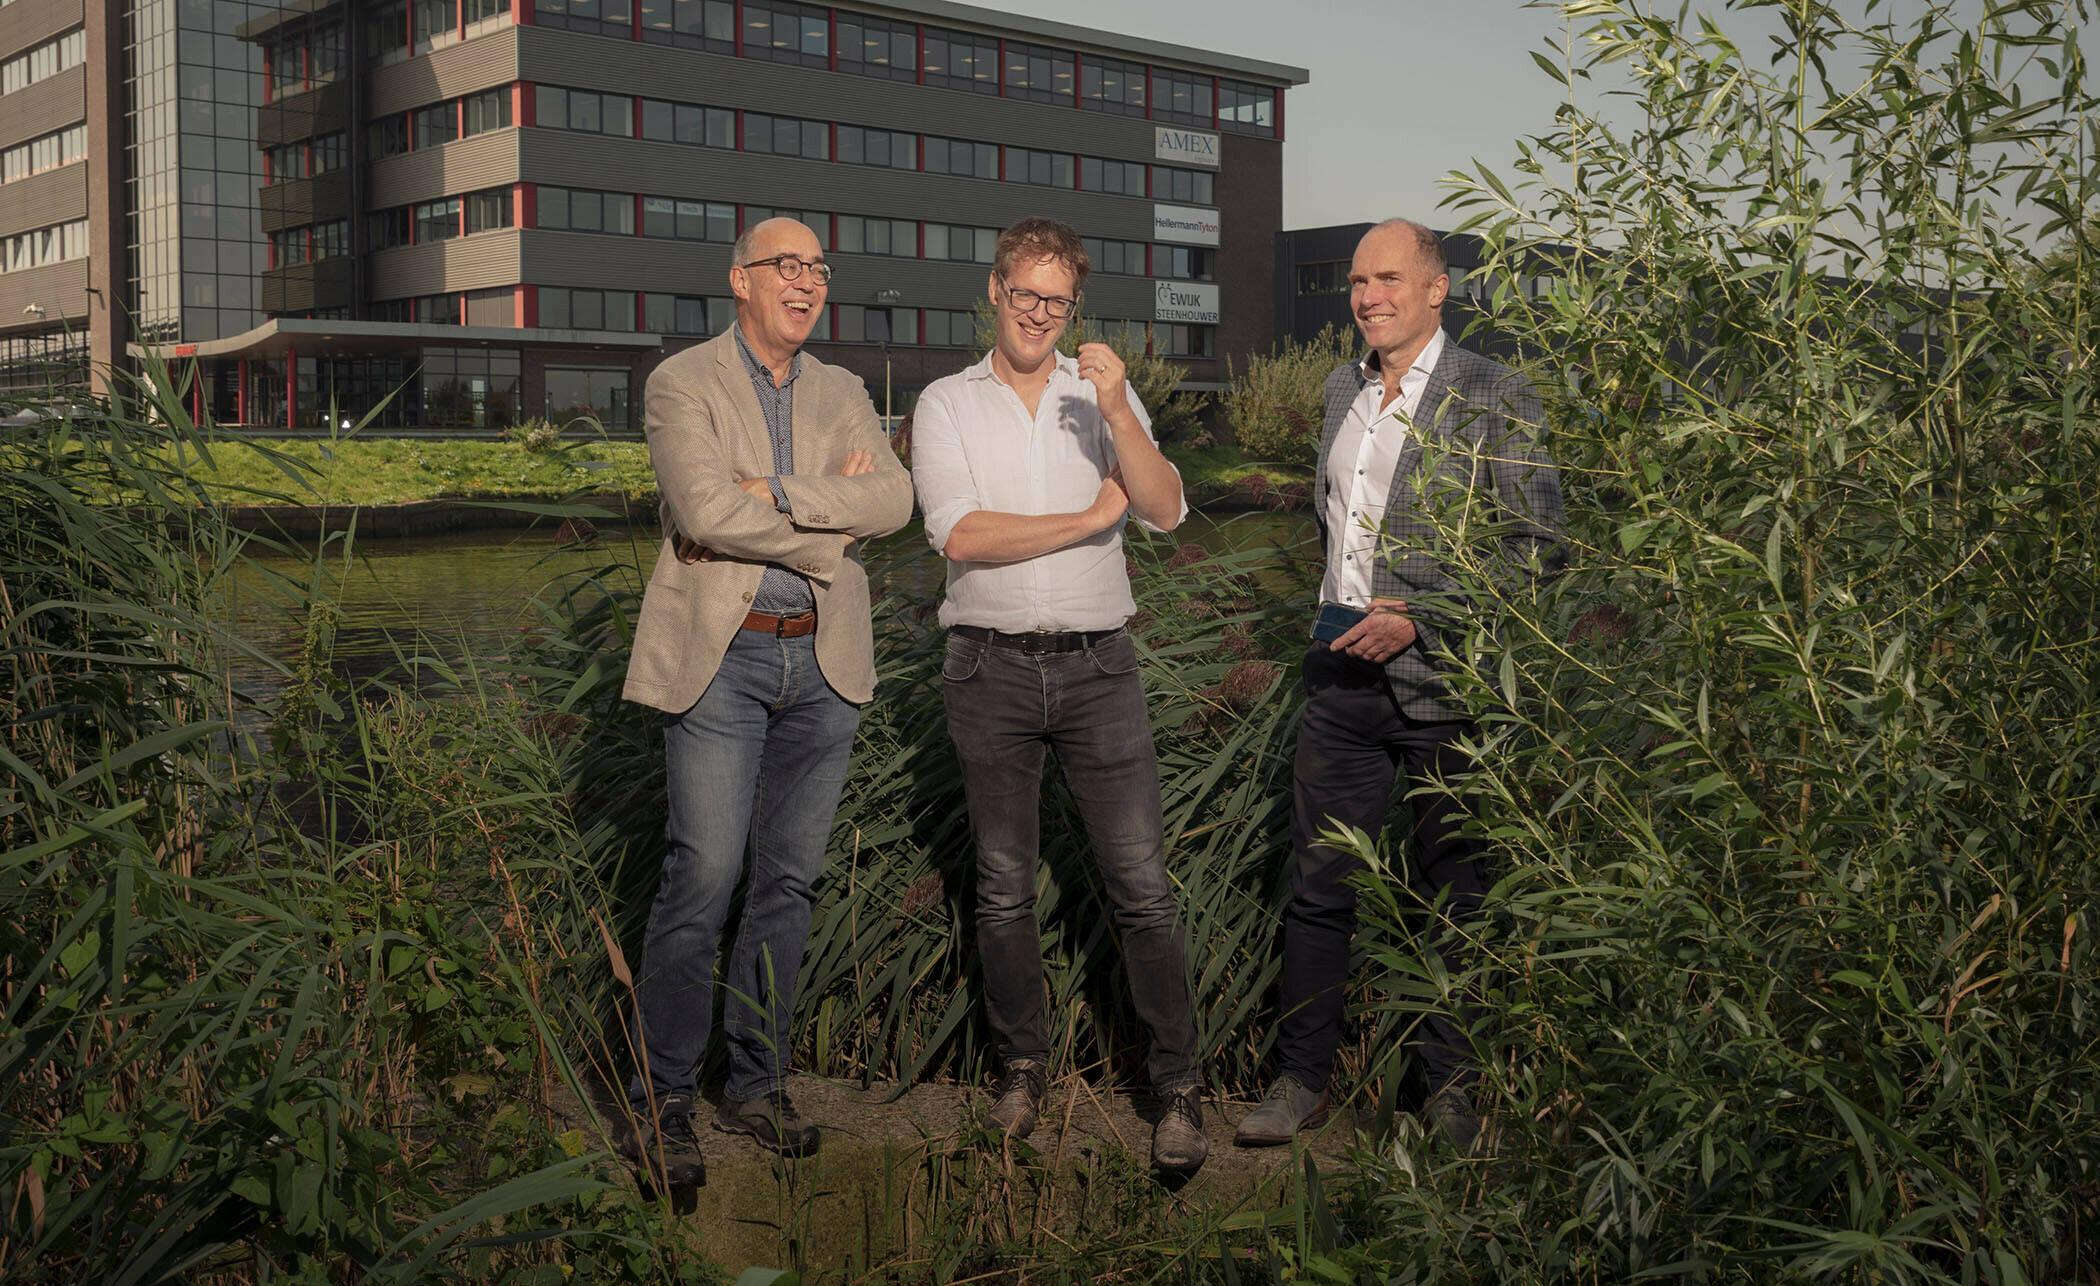 Foto met Ludolph Wentholt, Robin Biemans en Henk van Hemert